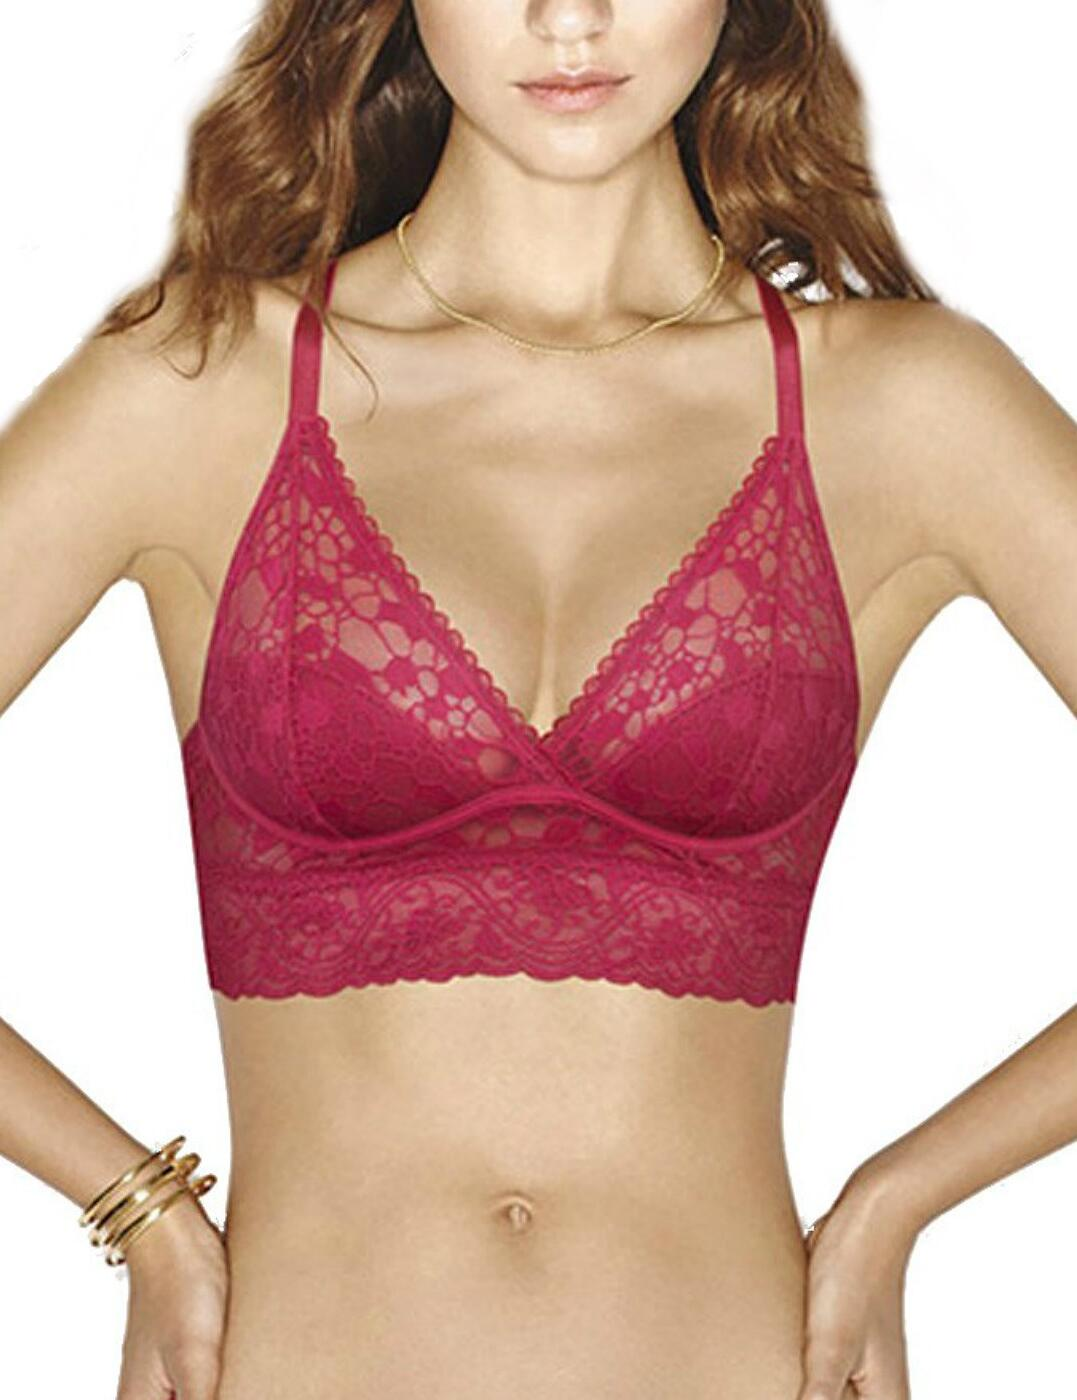 bbc0ebbd424d3 Wonderbra Sexy Bralette Triangle Push Up Bra W06TI Scarlett Red